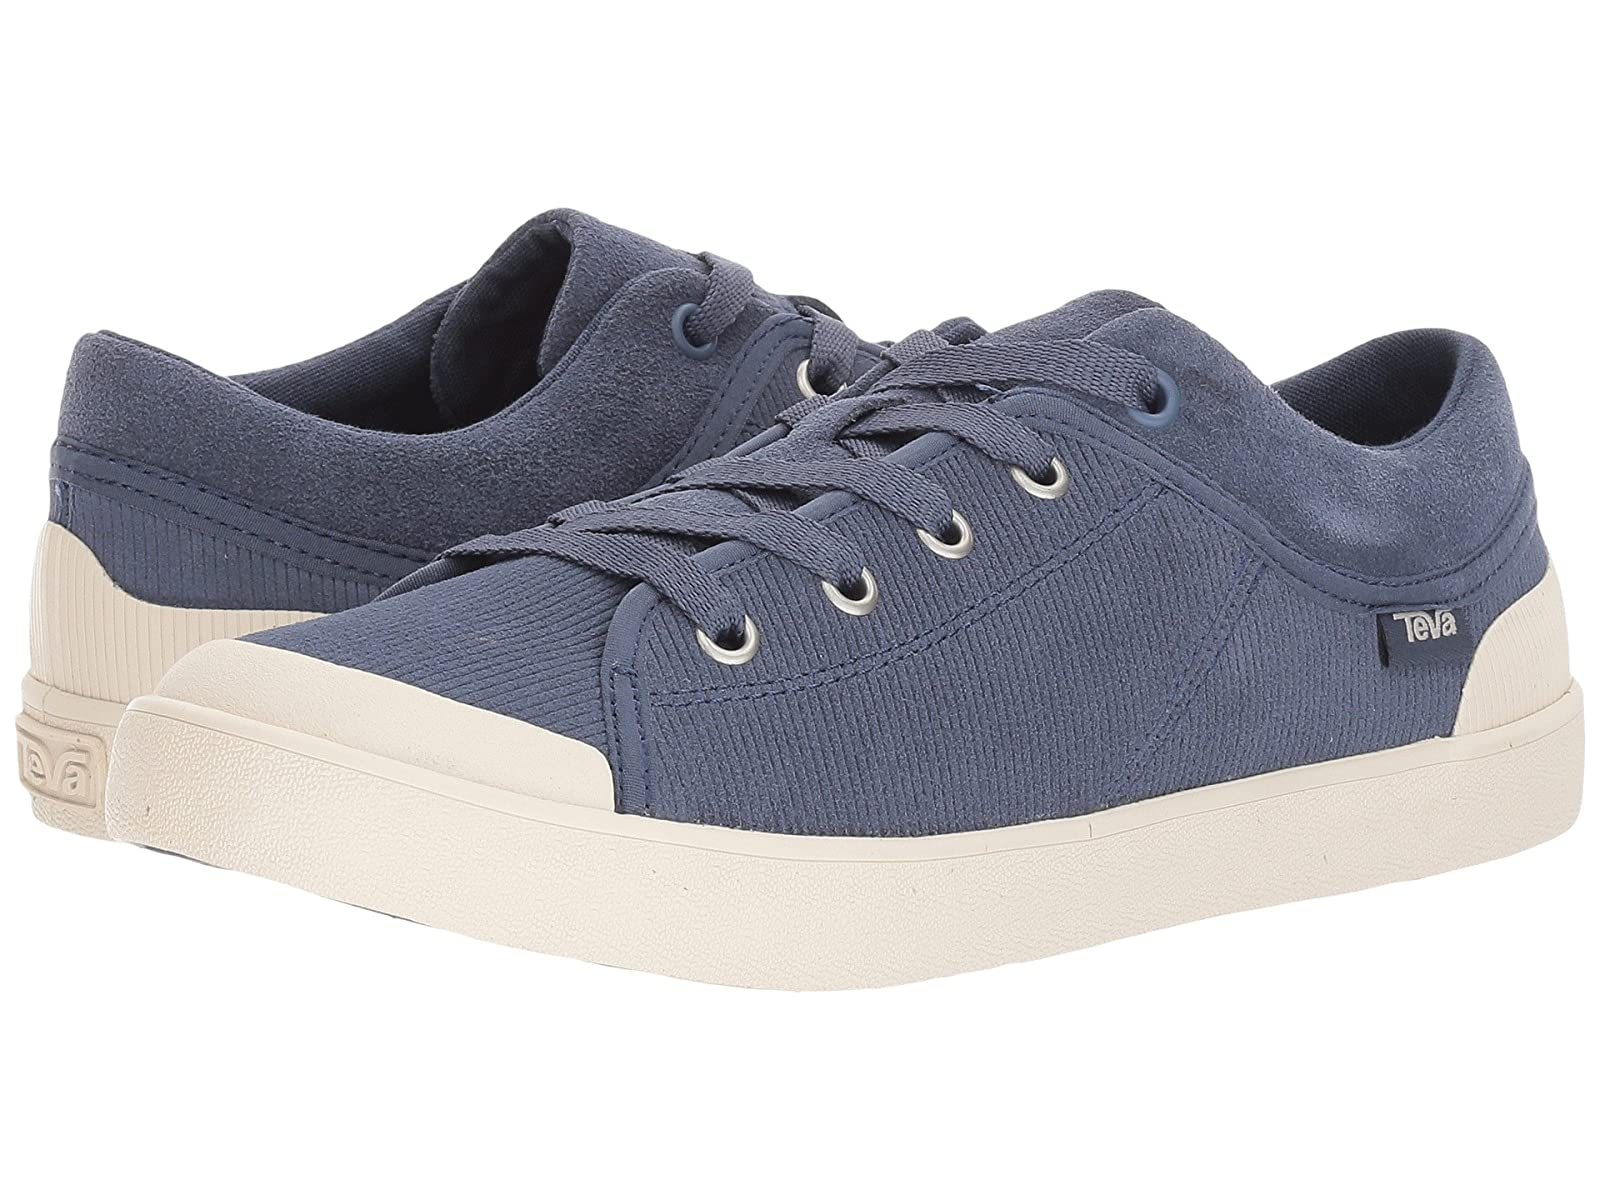 Teva Freewheel CorduroyCheap and distinctive eye-catching shoes